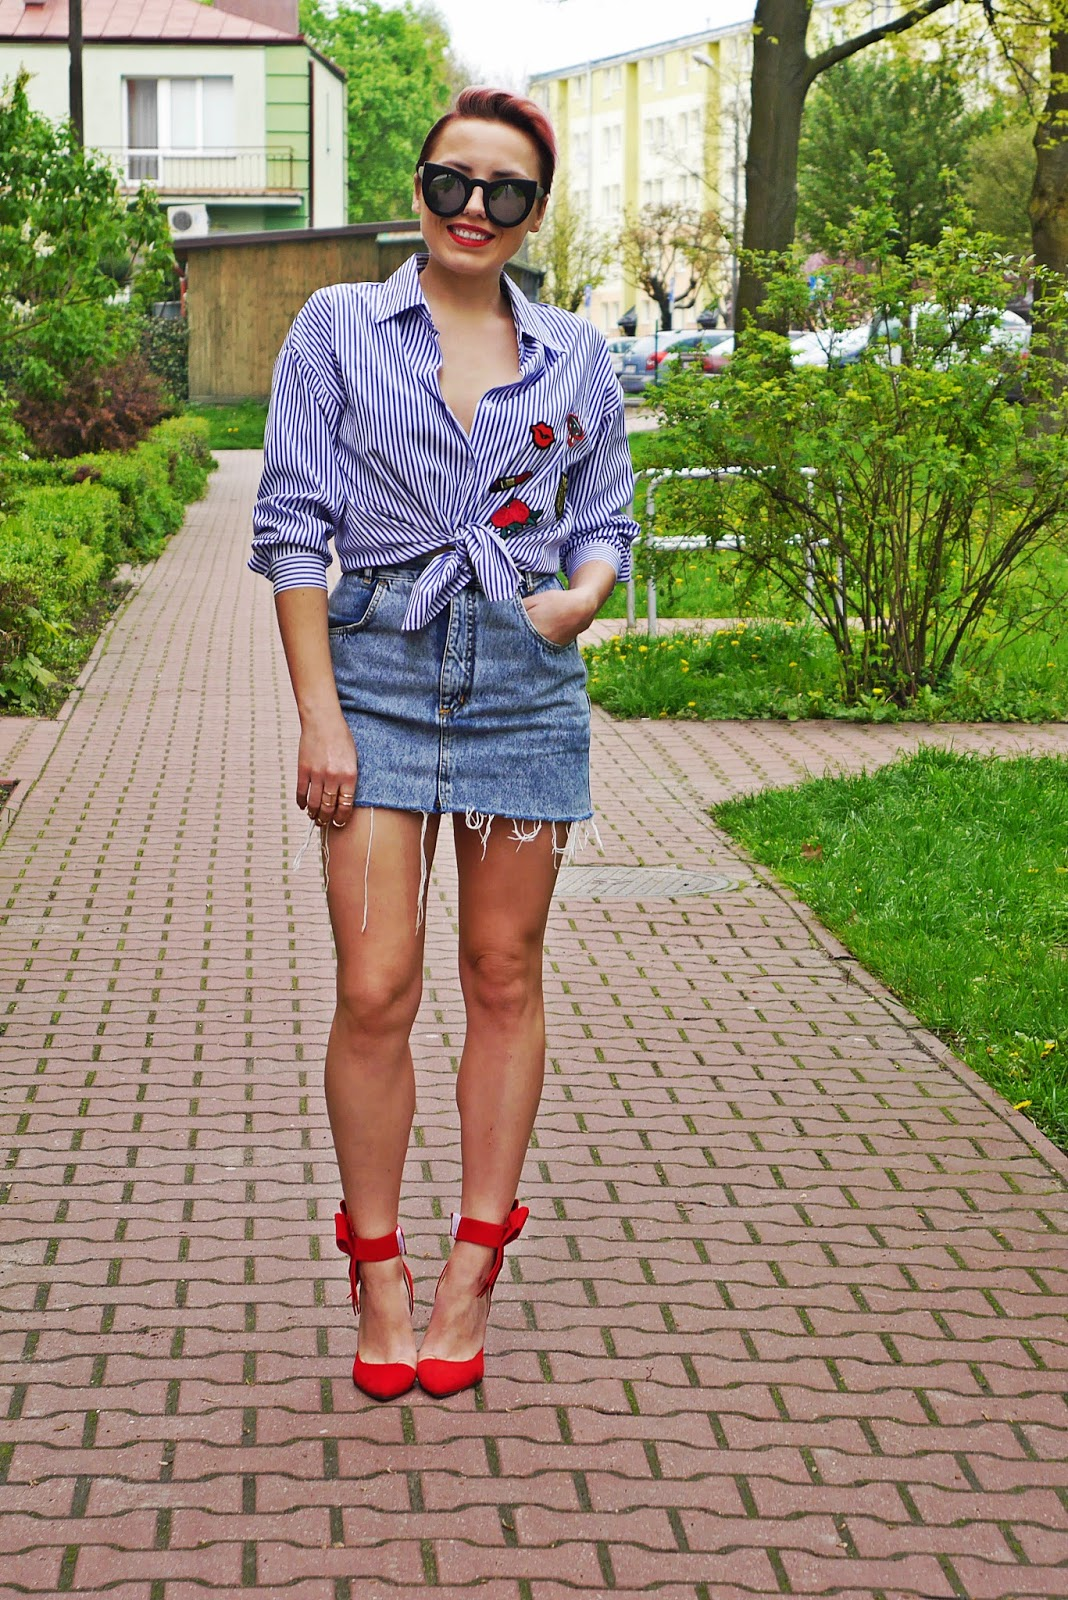 blogerka_modowa_pulawy_blog_modowy_karyn_look_ootd_110517b